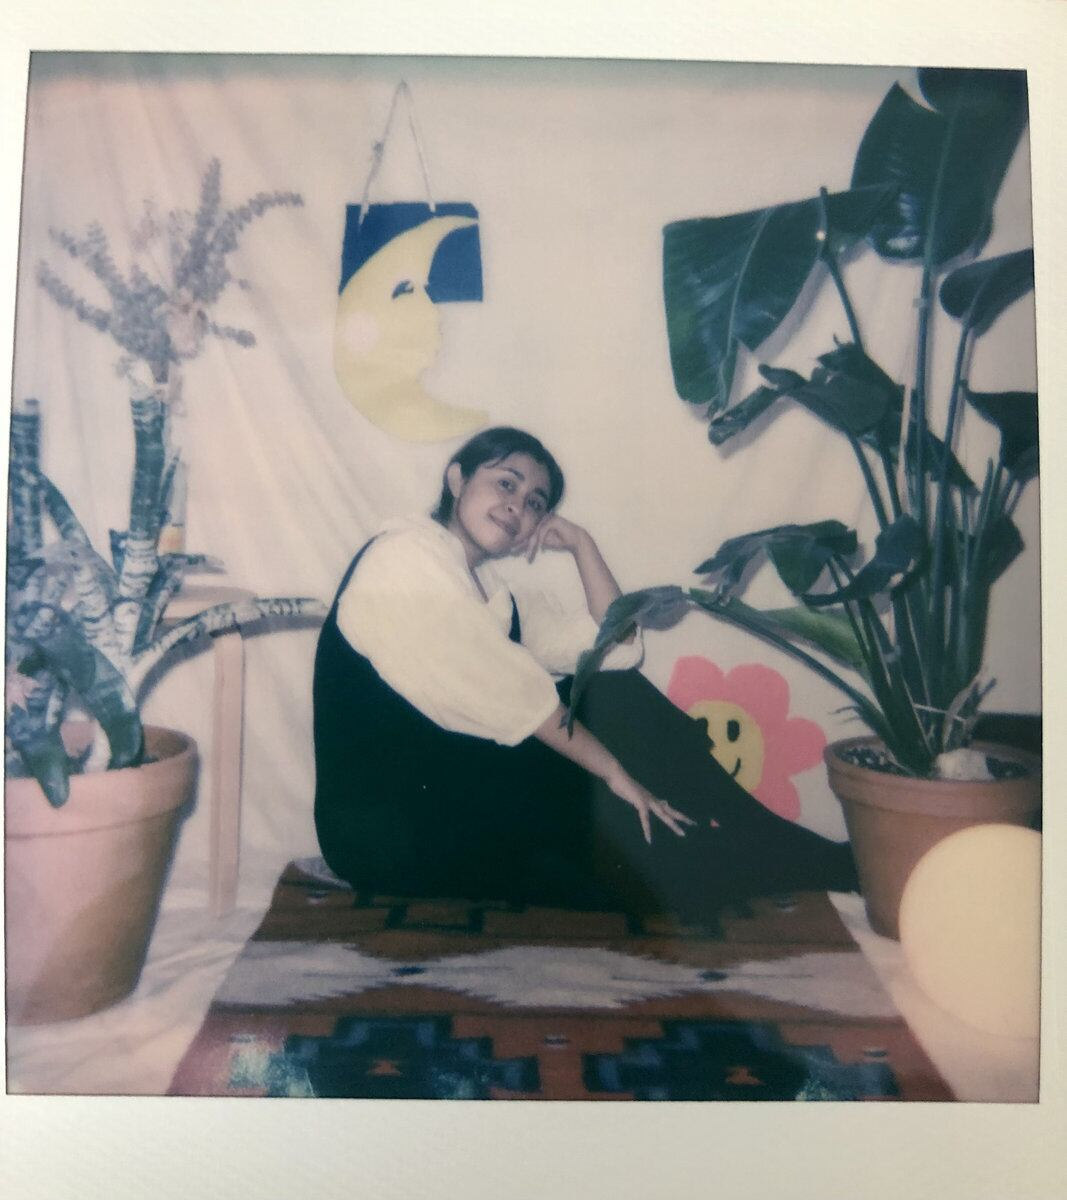 Mia Joy / Spirit Tamer(300 Ltd Pink LP)